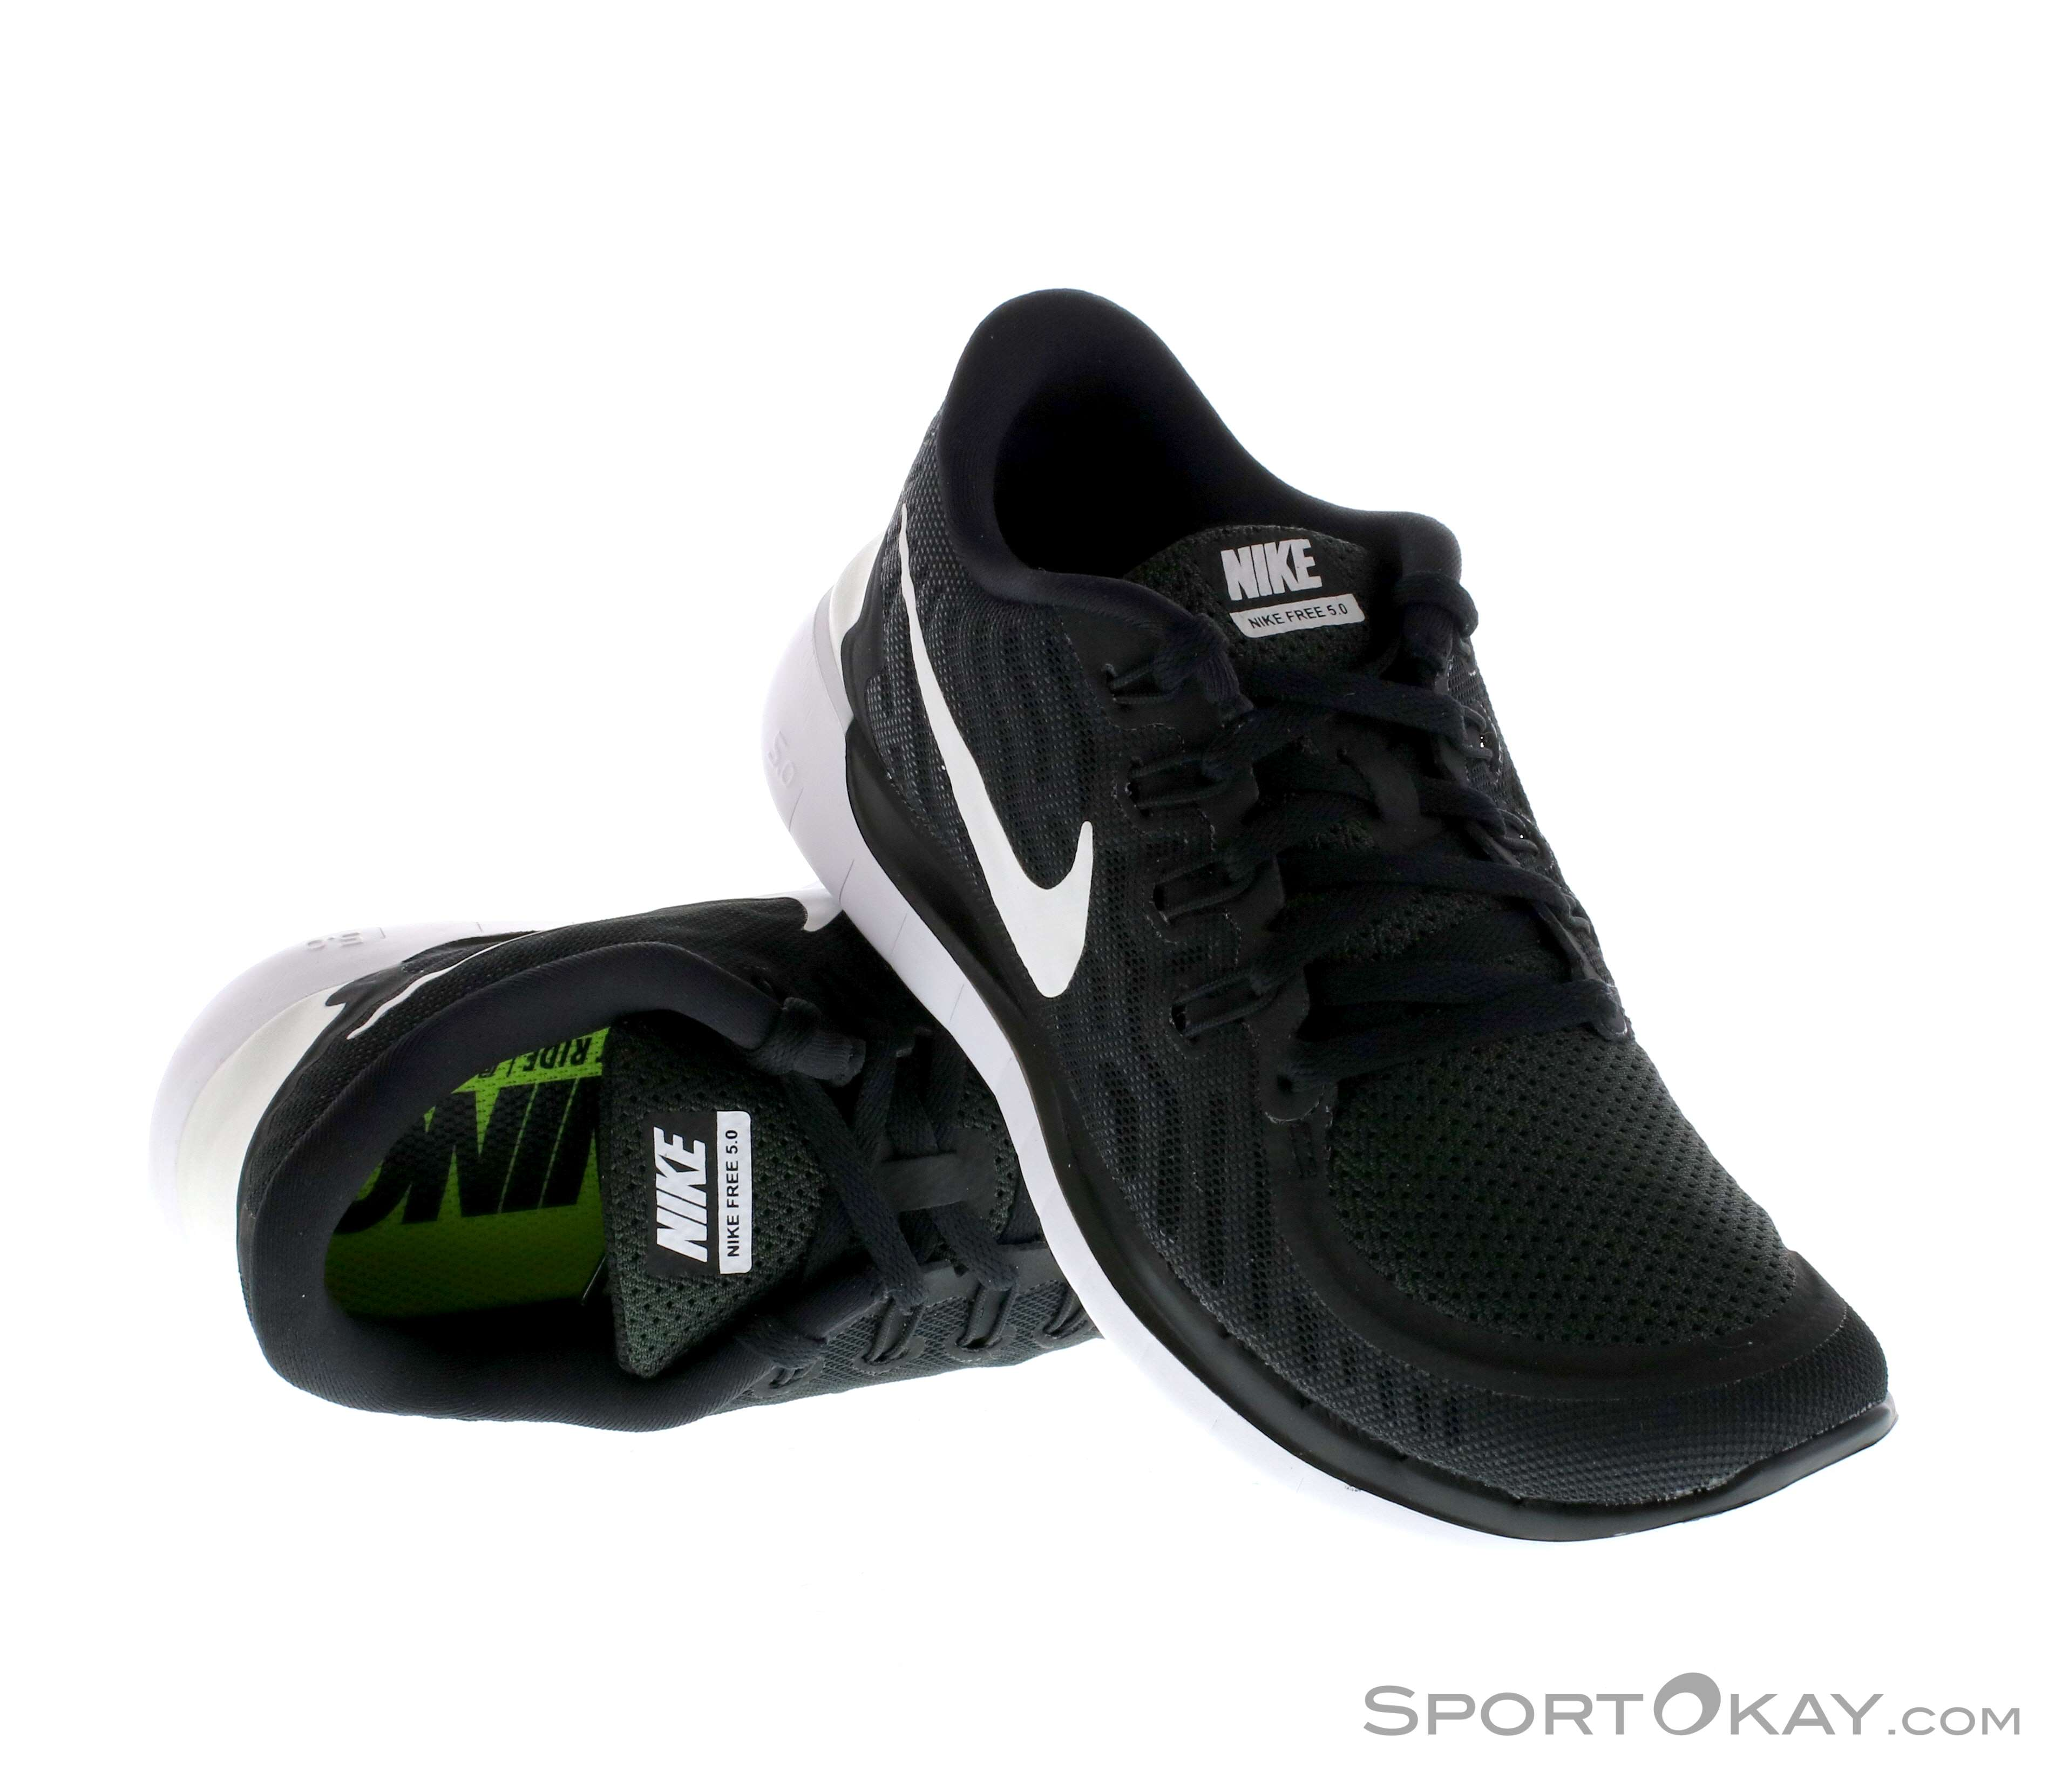 Nike Running Fuel Band Free 5.0 V2 Nike Free 5.0 Dark Grey